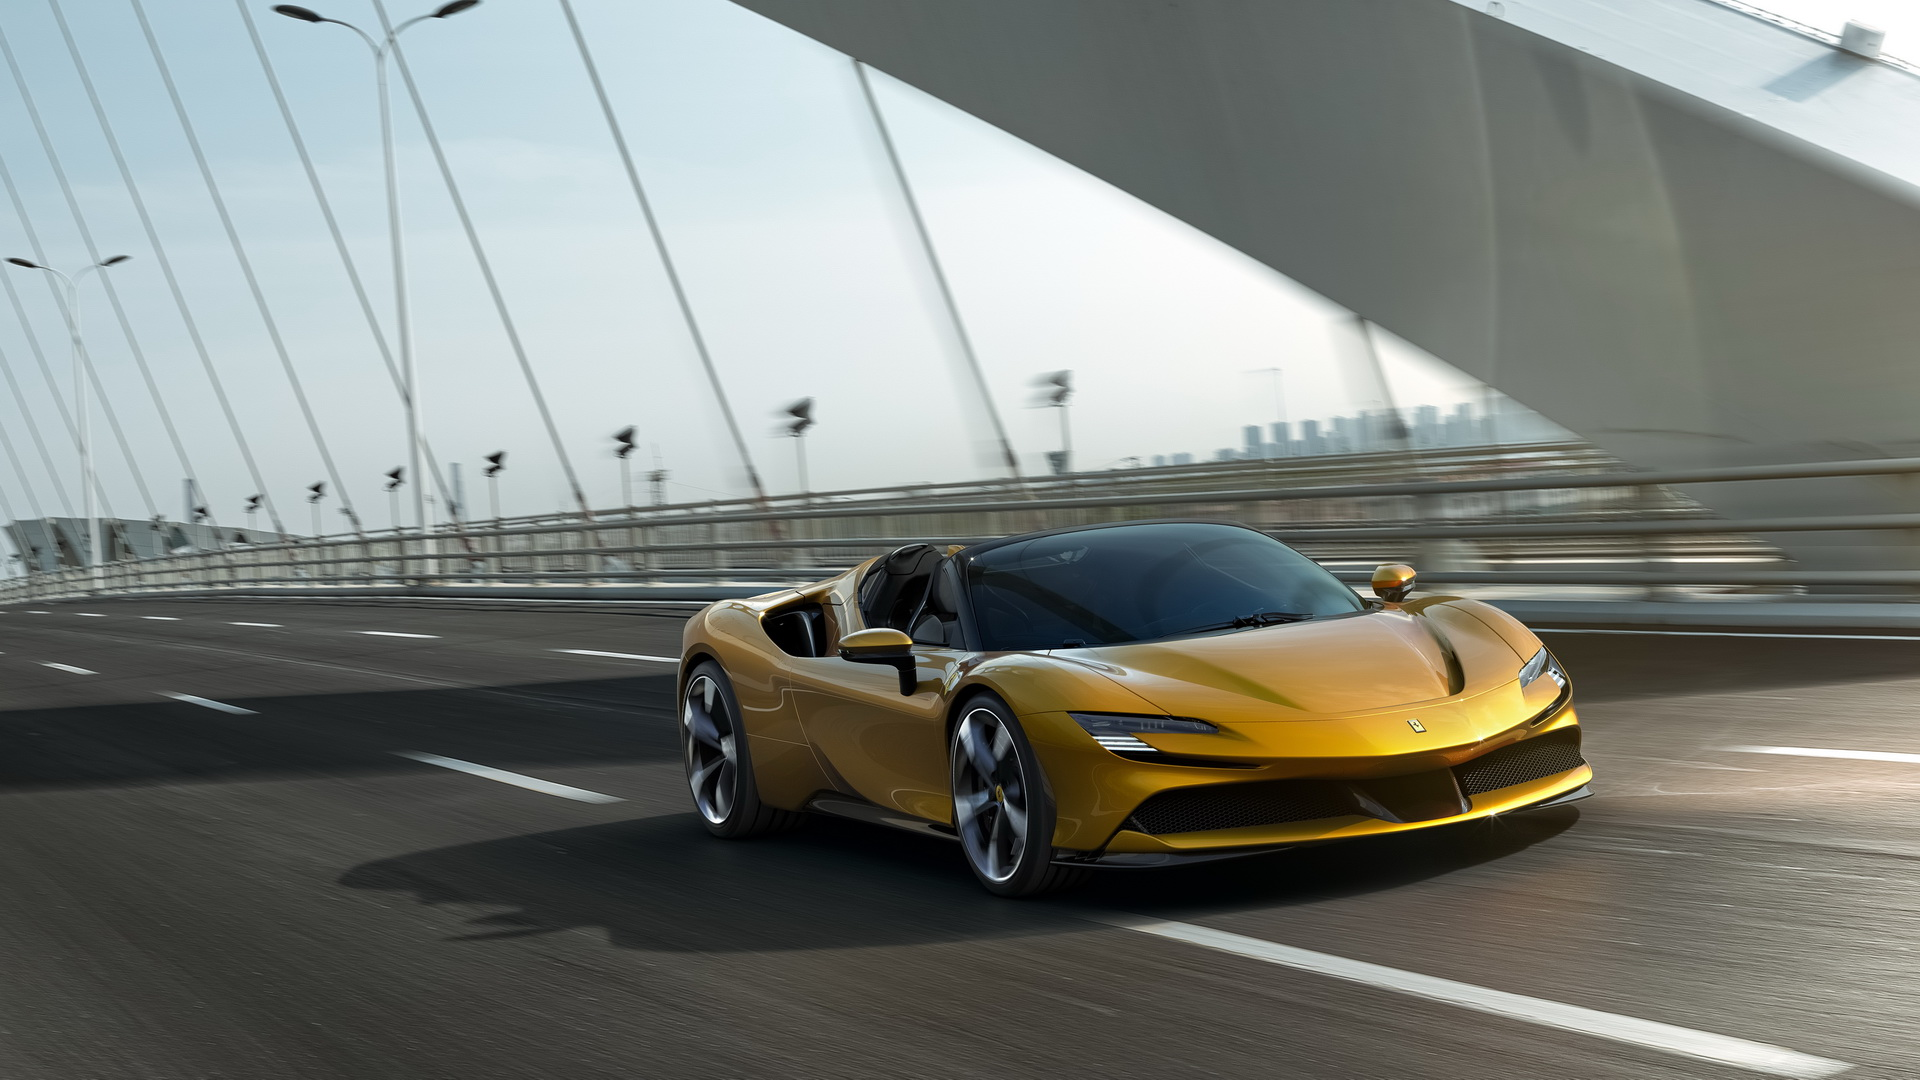 La nuova Ferrari SF90 Spider è stata svelata